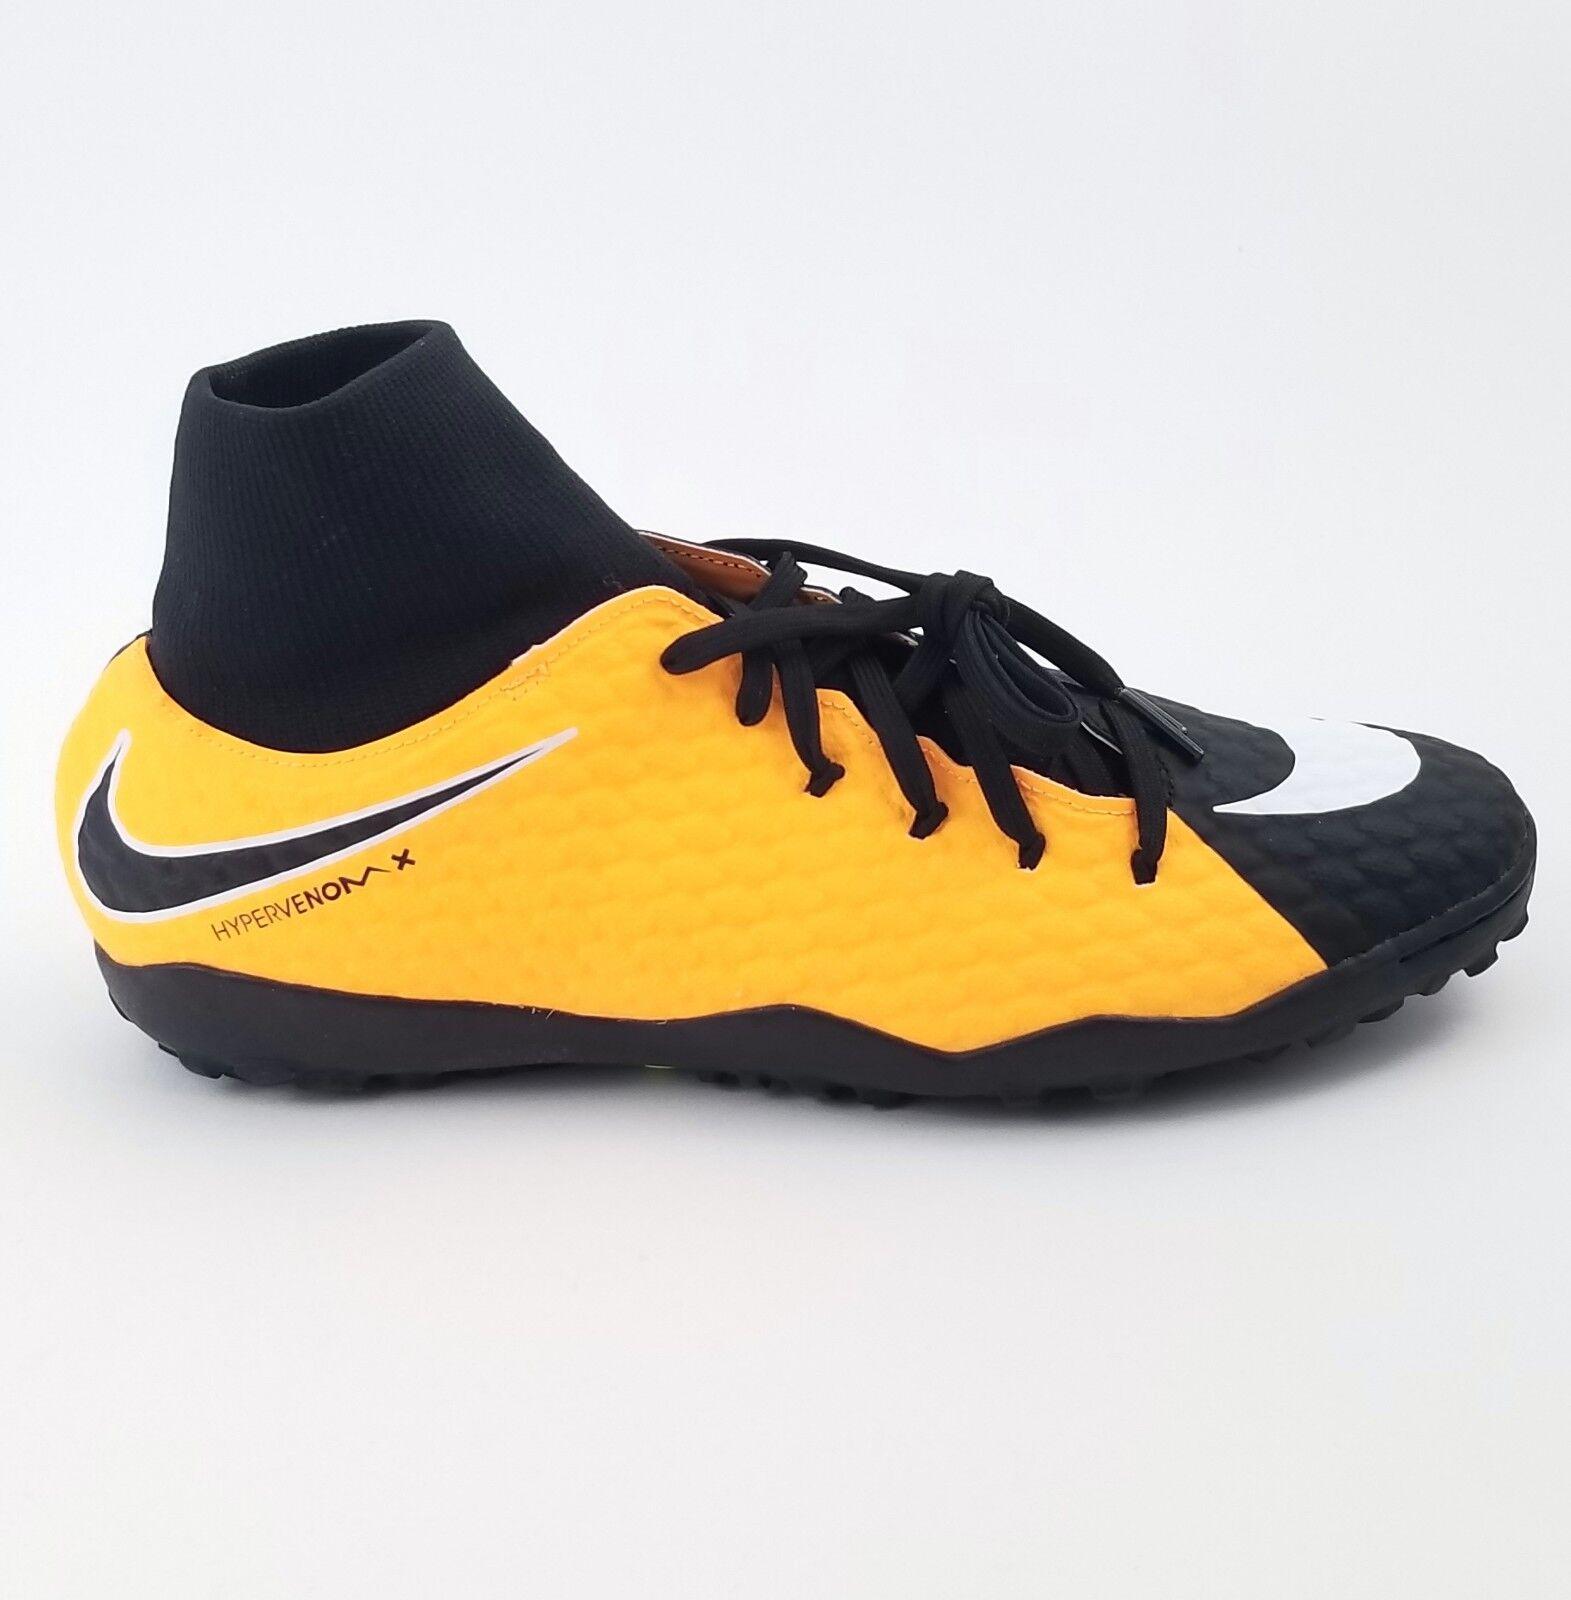 NIKE HyperVenom Phelon 3 DF TF orange Mens Sz 8.5 Indoor Soccer shoes 917769-801